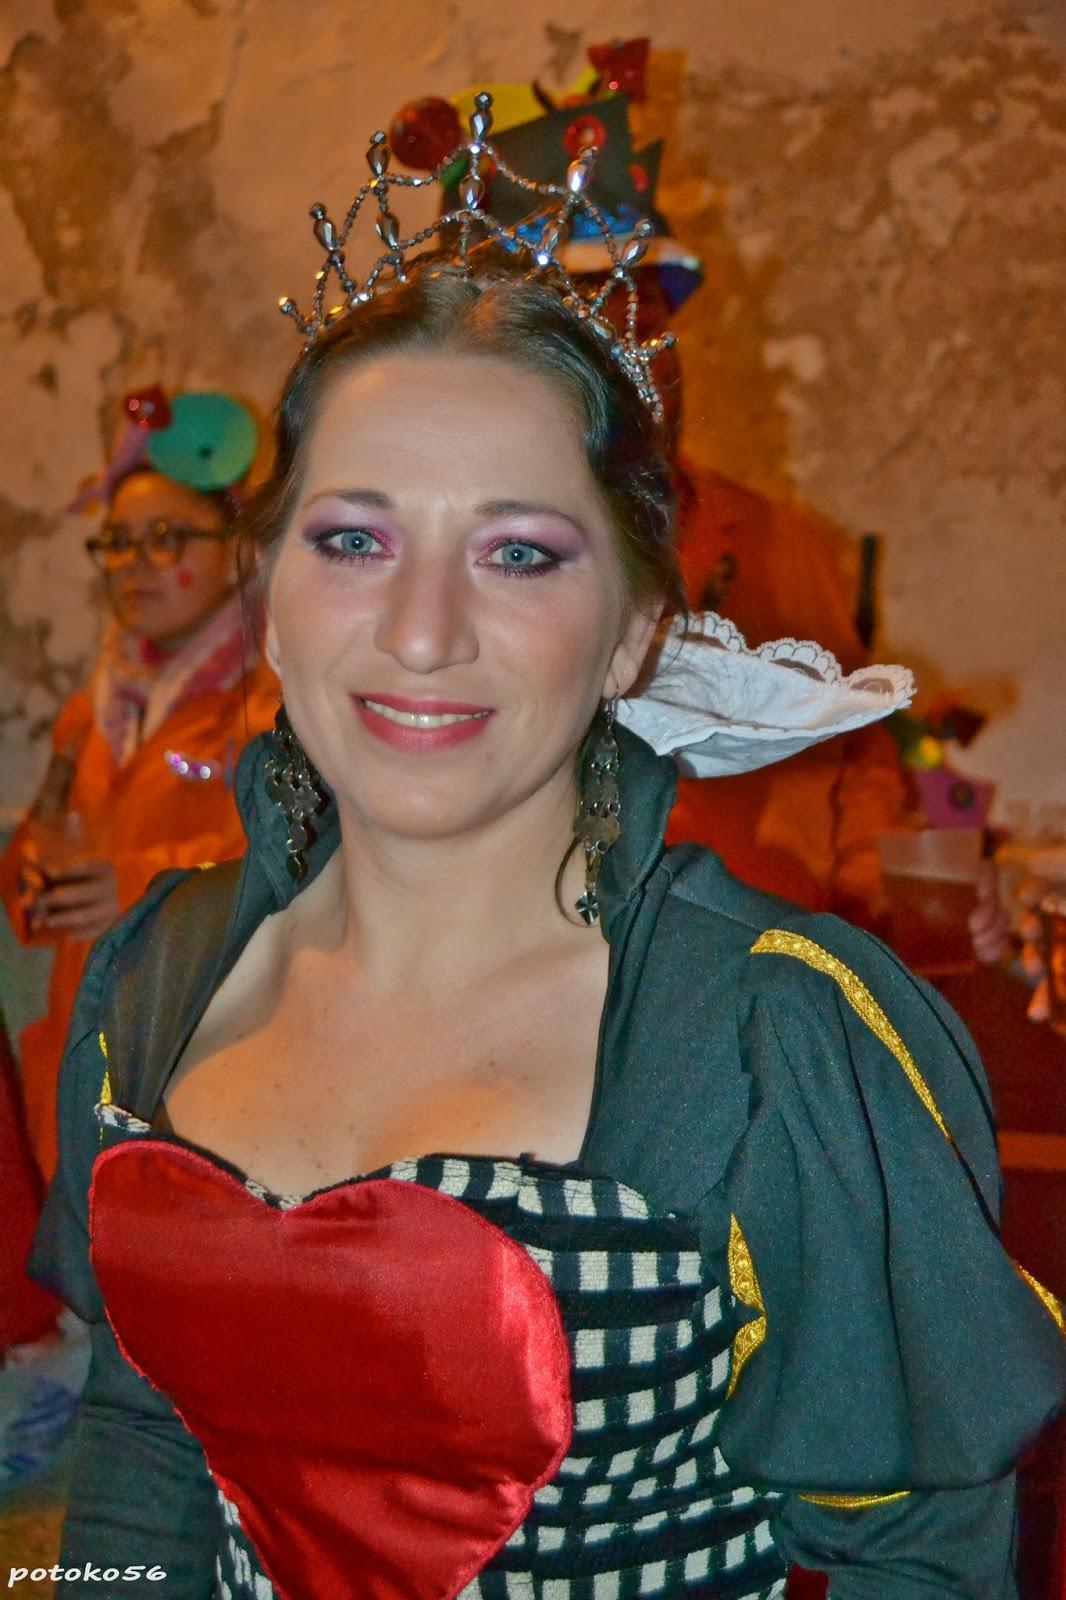 carnaval en la Mina Rota - Disfraz